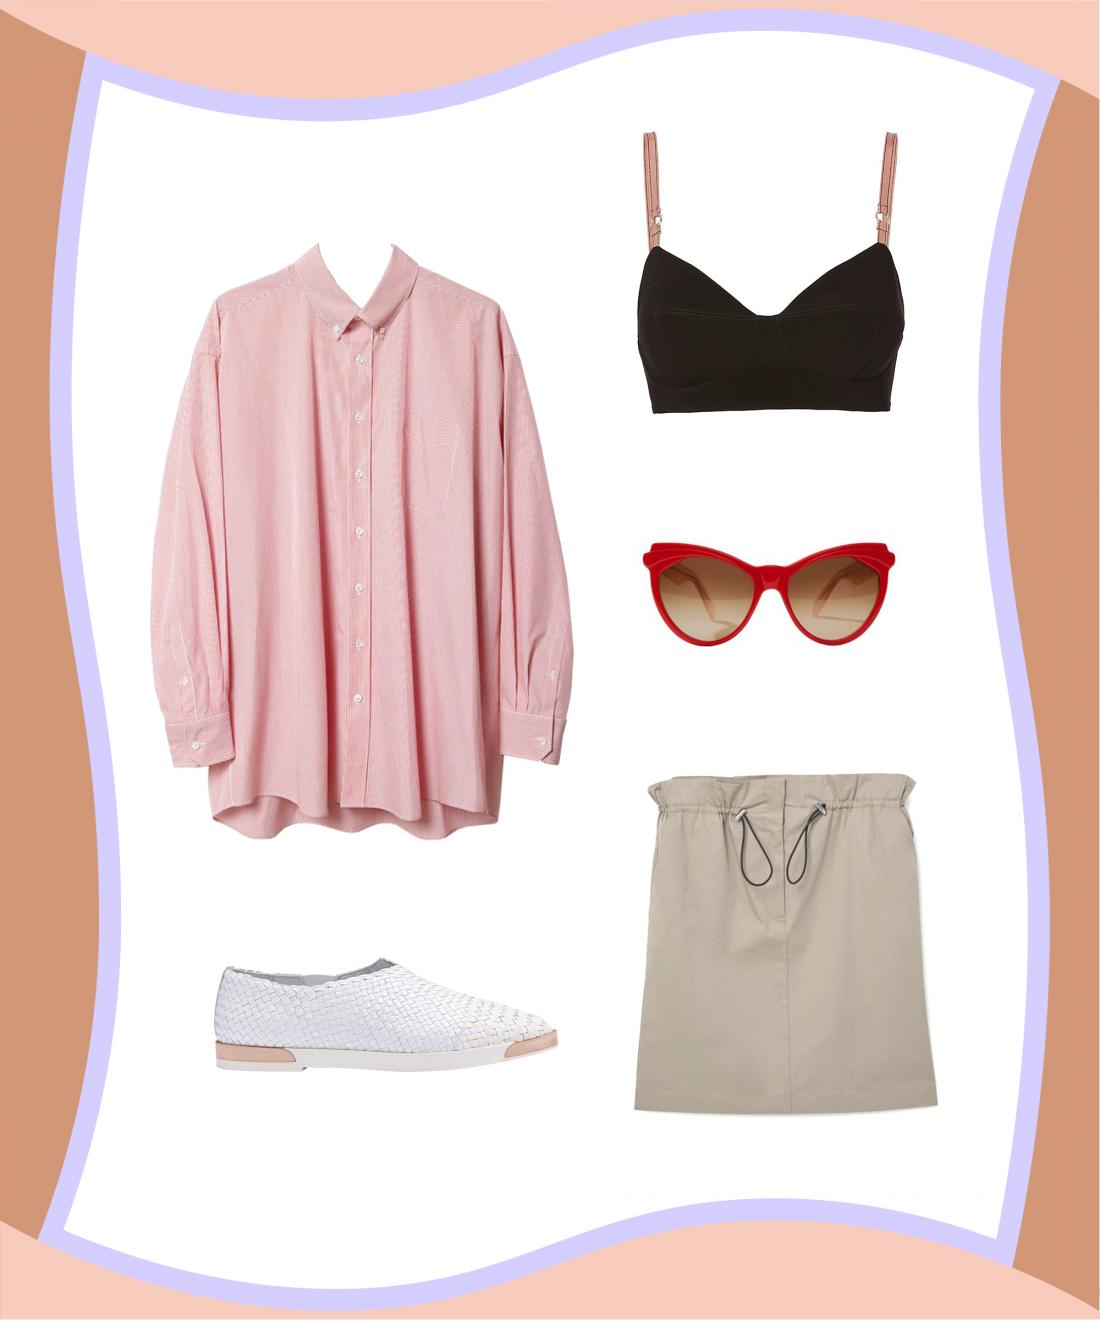 Рубашка + юбка + бралетт